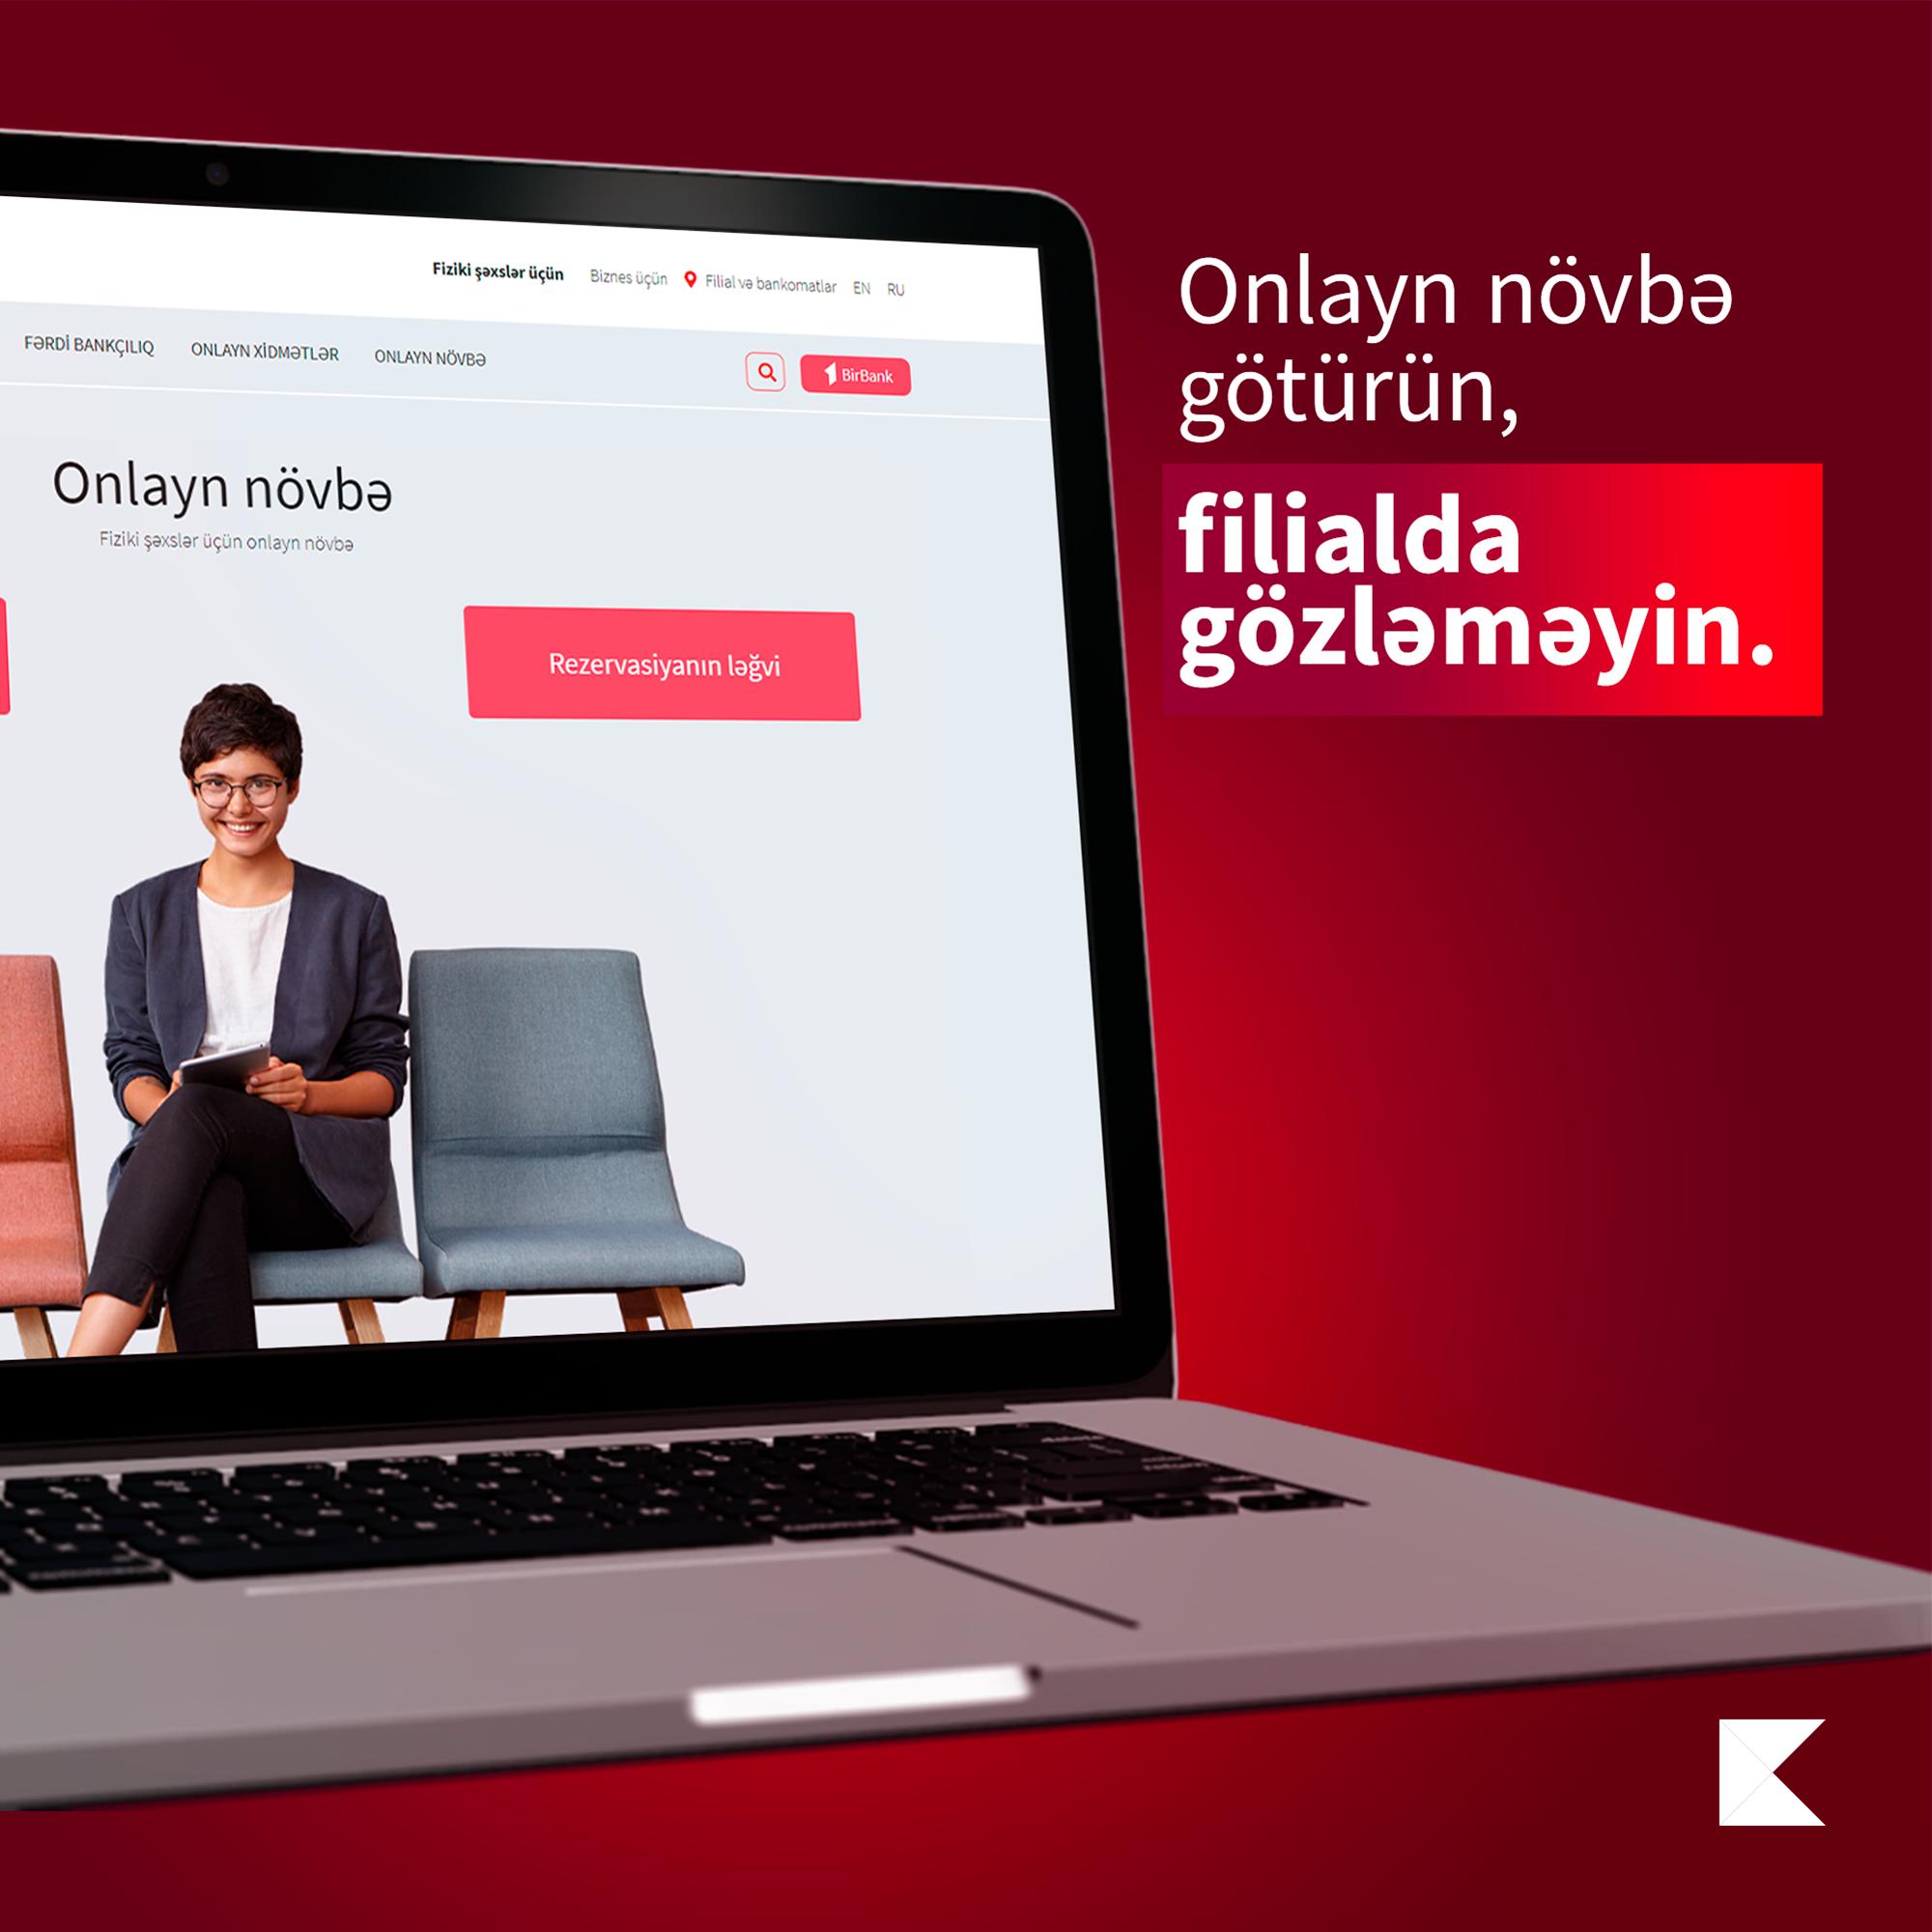 Kapital Bank предоставил услугу онлайн-очереди и для физических лиц